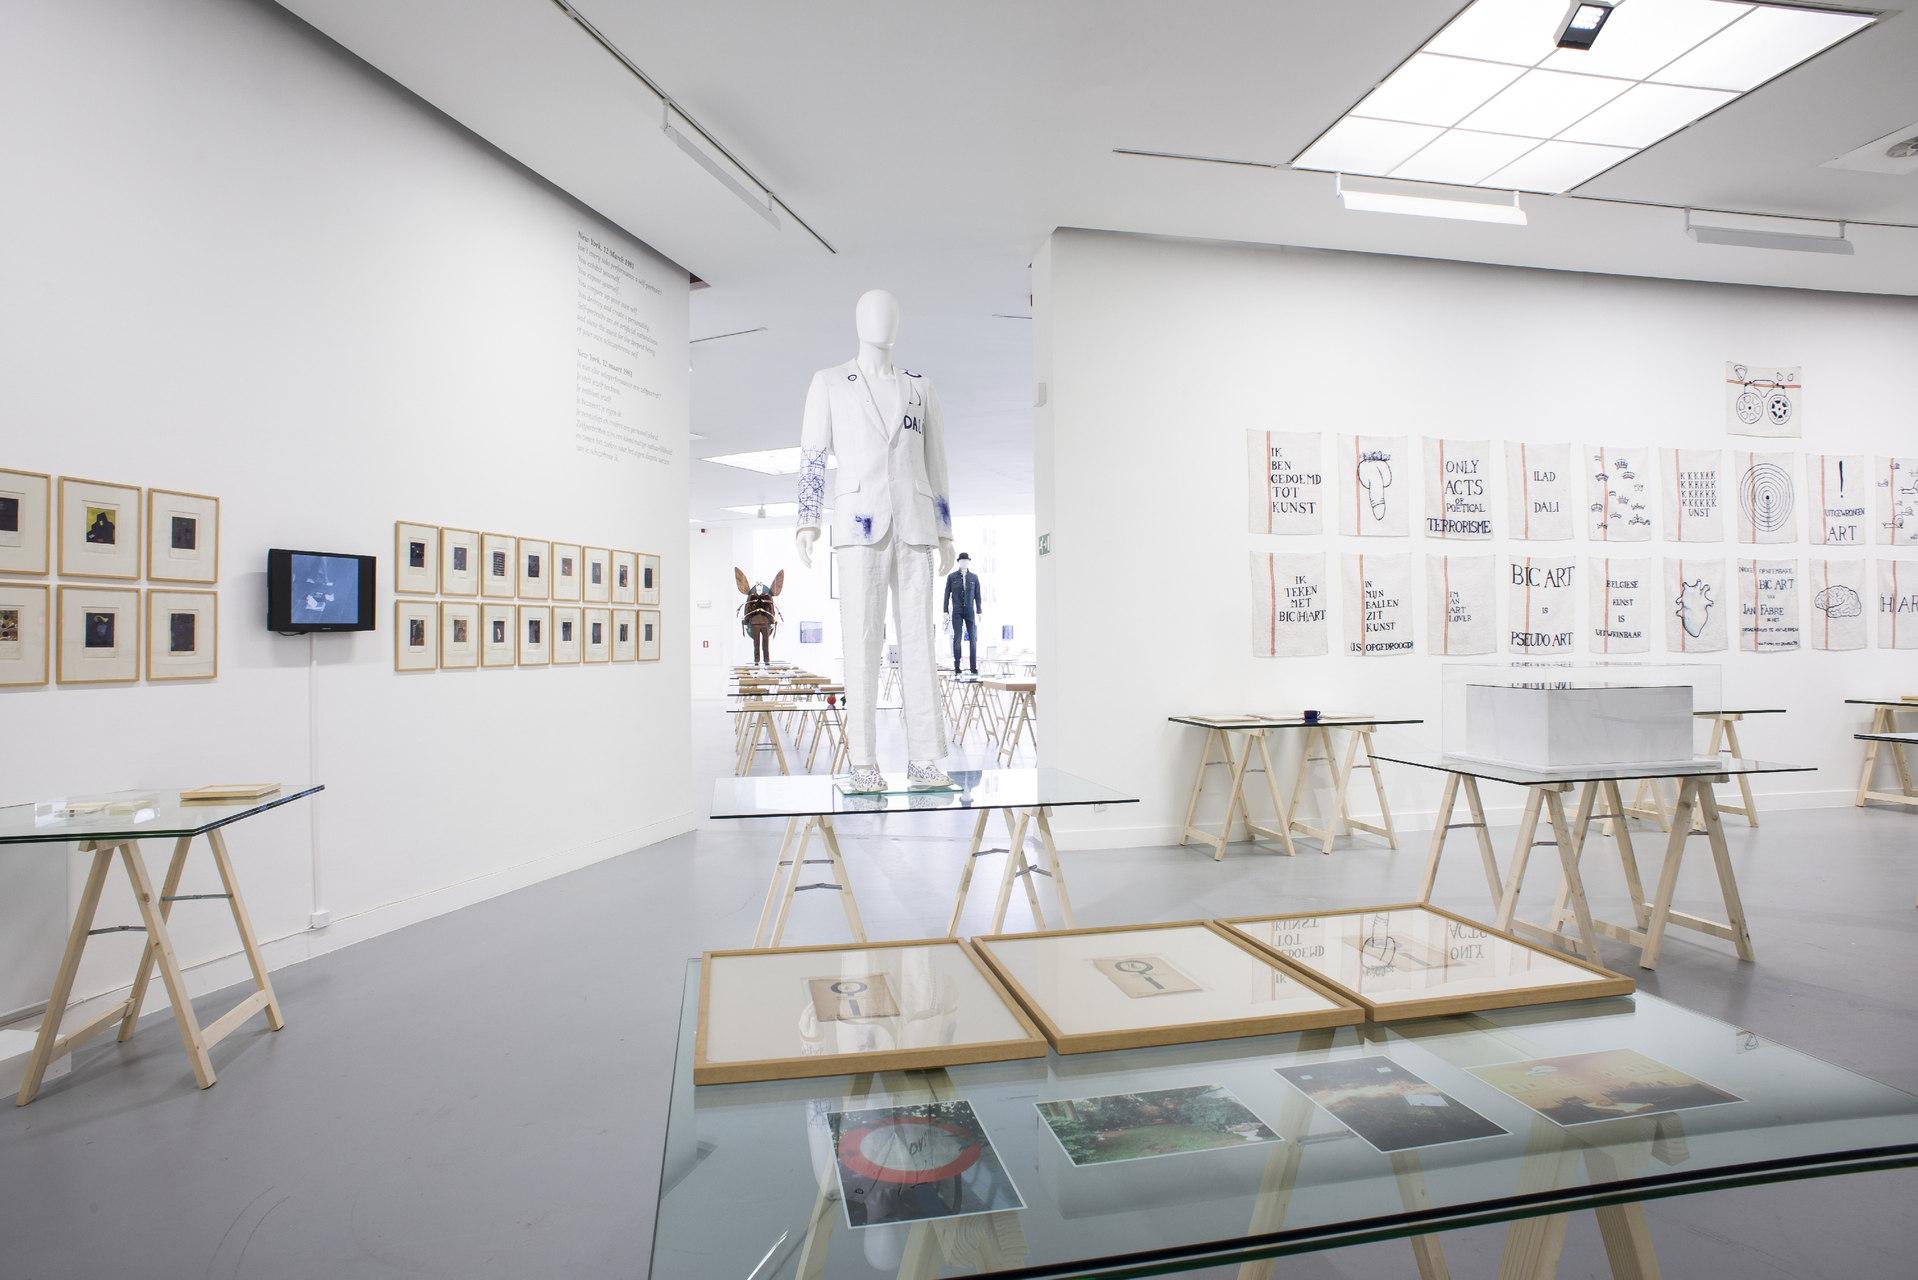 Jan_Fabre,_exhibition_view_M_HKA_2015_photo_M_HKAclinckx16